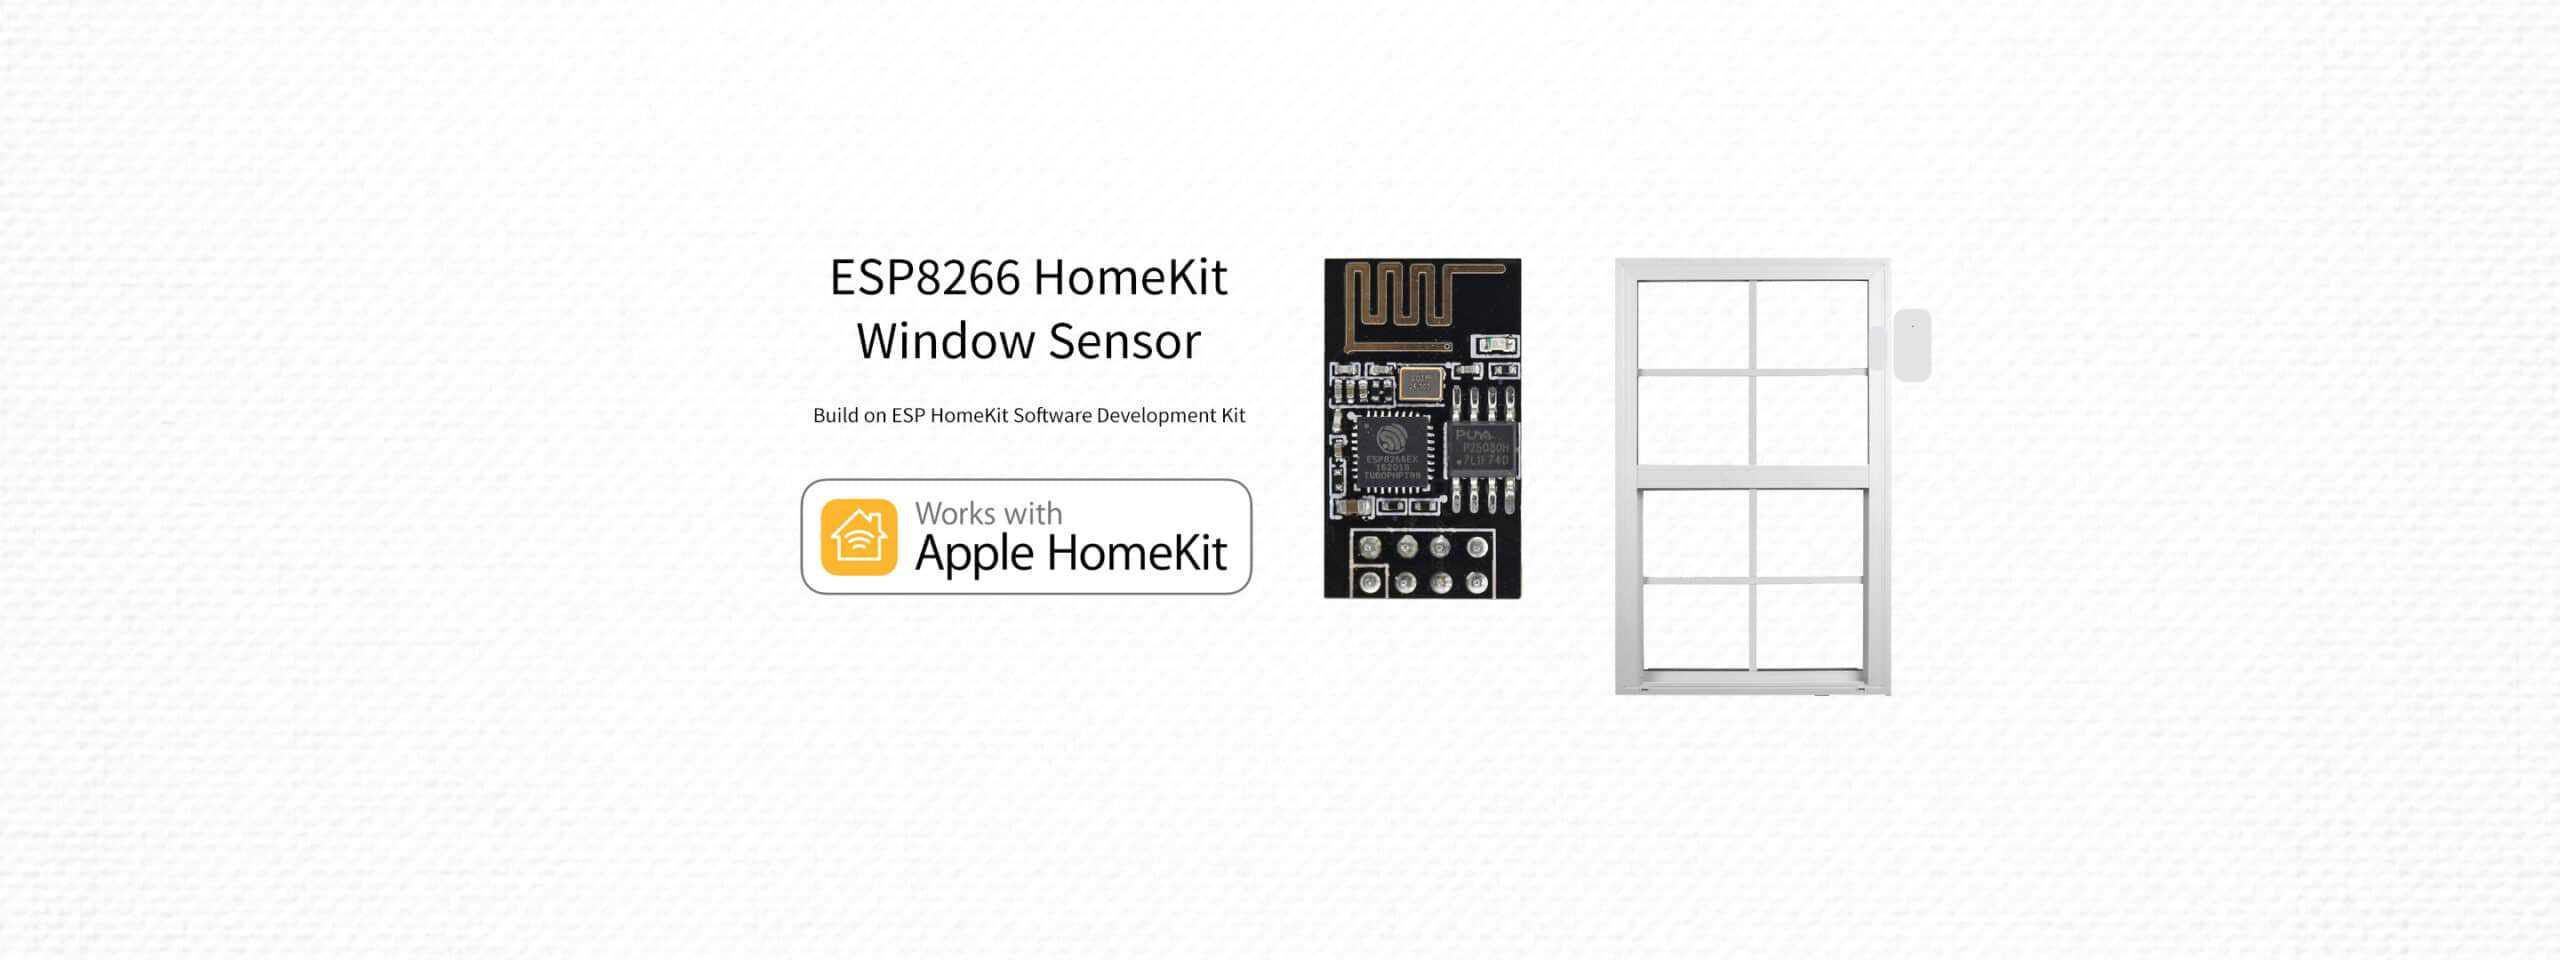 ESP8266 – HomeKit Window Sensor